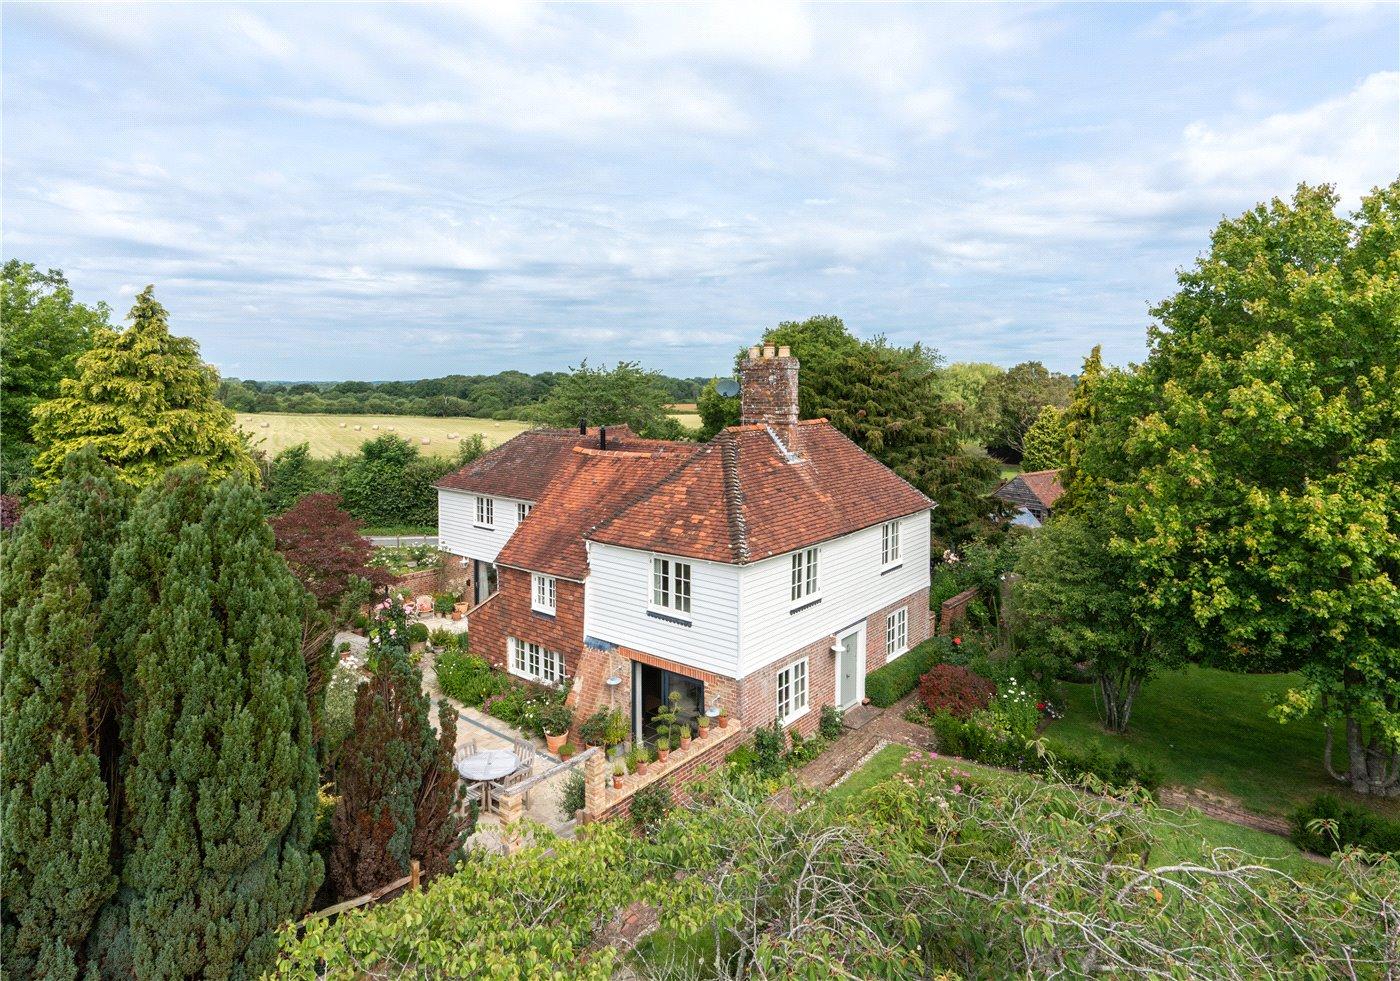 Five bedroom house near Barcombe Mills